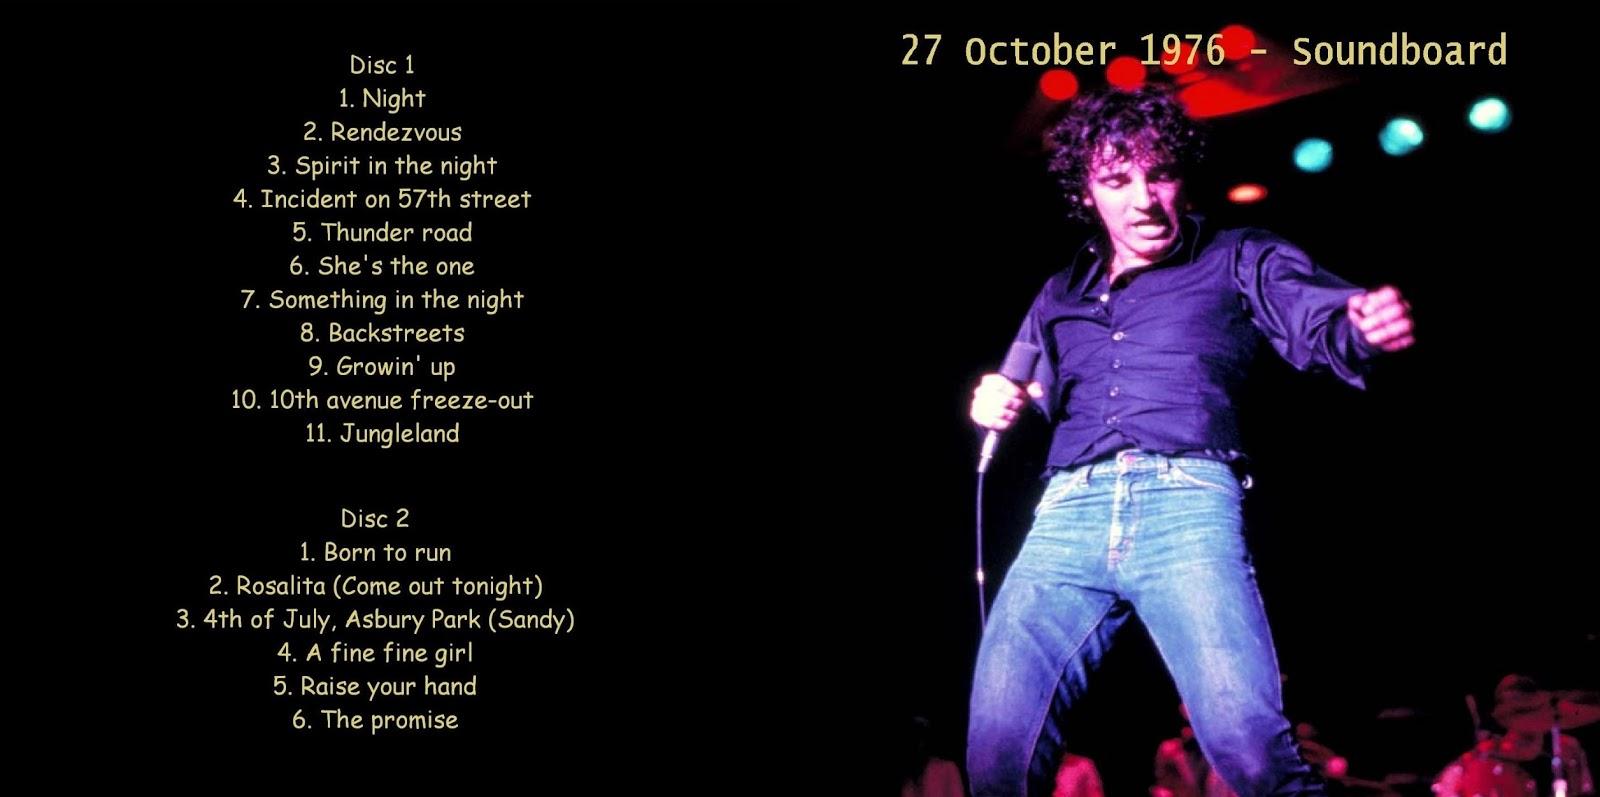 Plumdusty s page pink floyd 1975 06 12 spectrum theater philadelphia - Bruce Springsteen 1976 10 27 Philadelphia Pa Sbd Flac